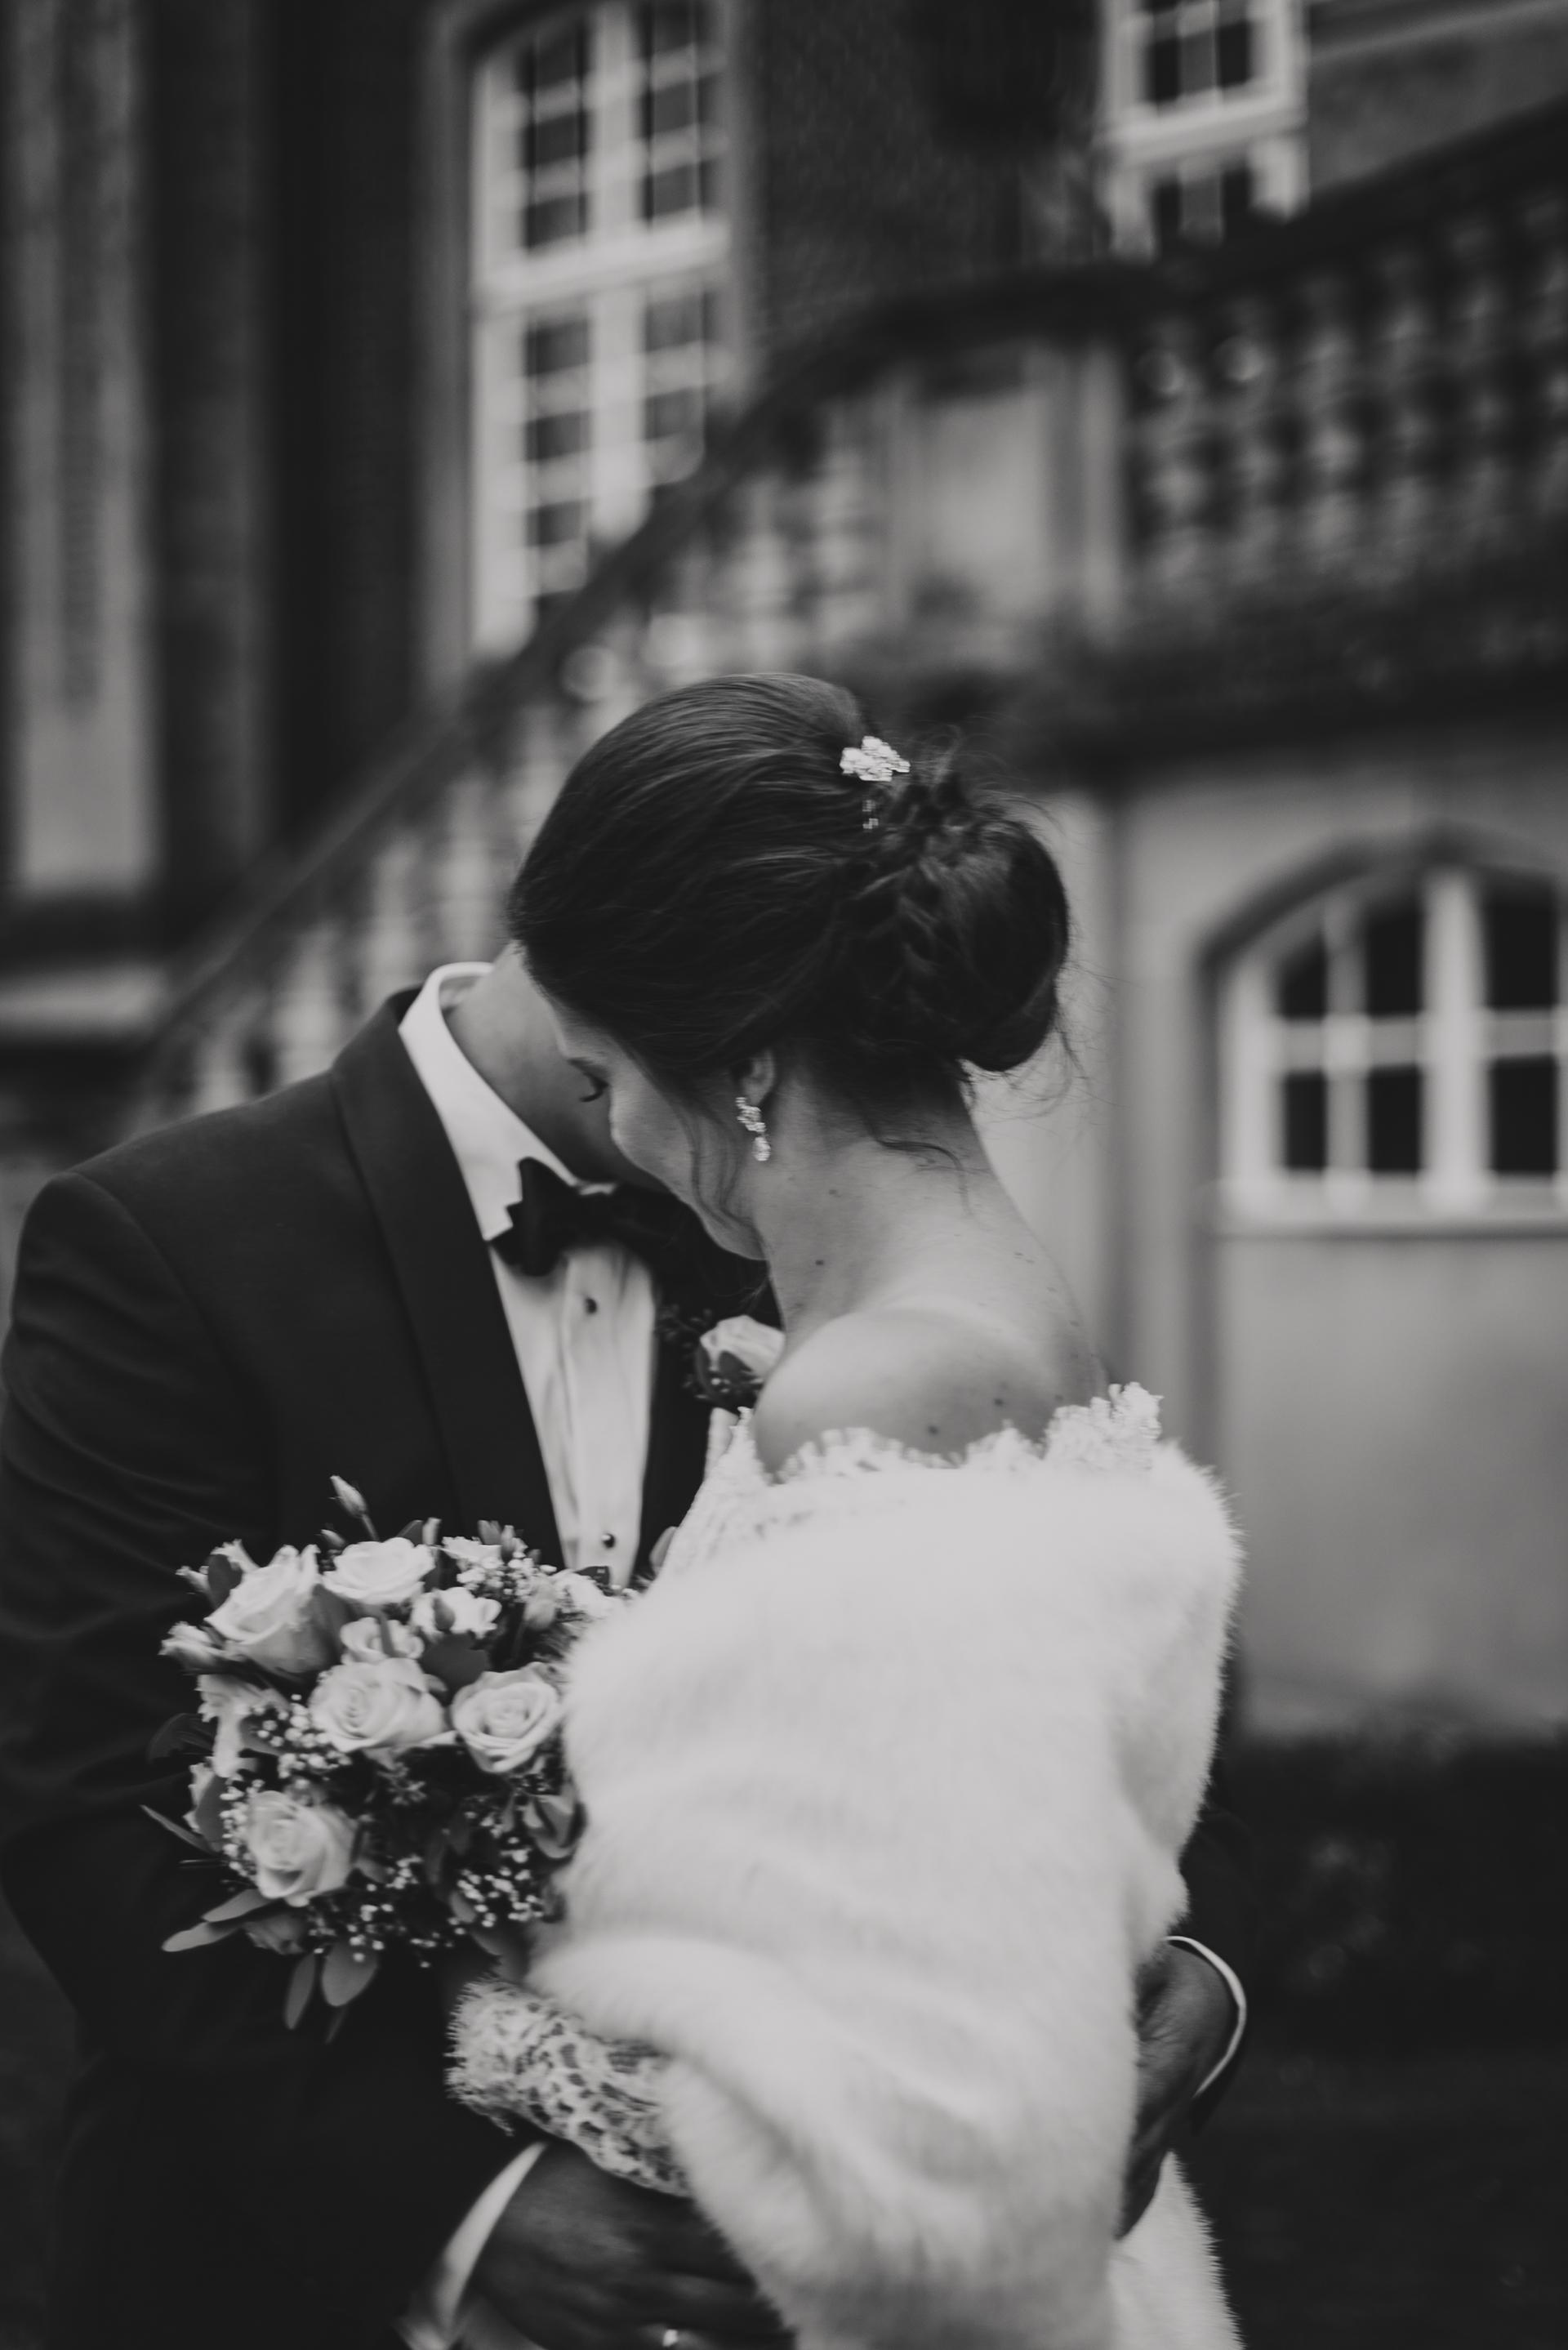 Hochzeitsreportage_J&D_064_Caroline Queda Fotografie